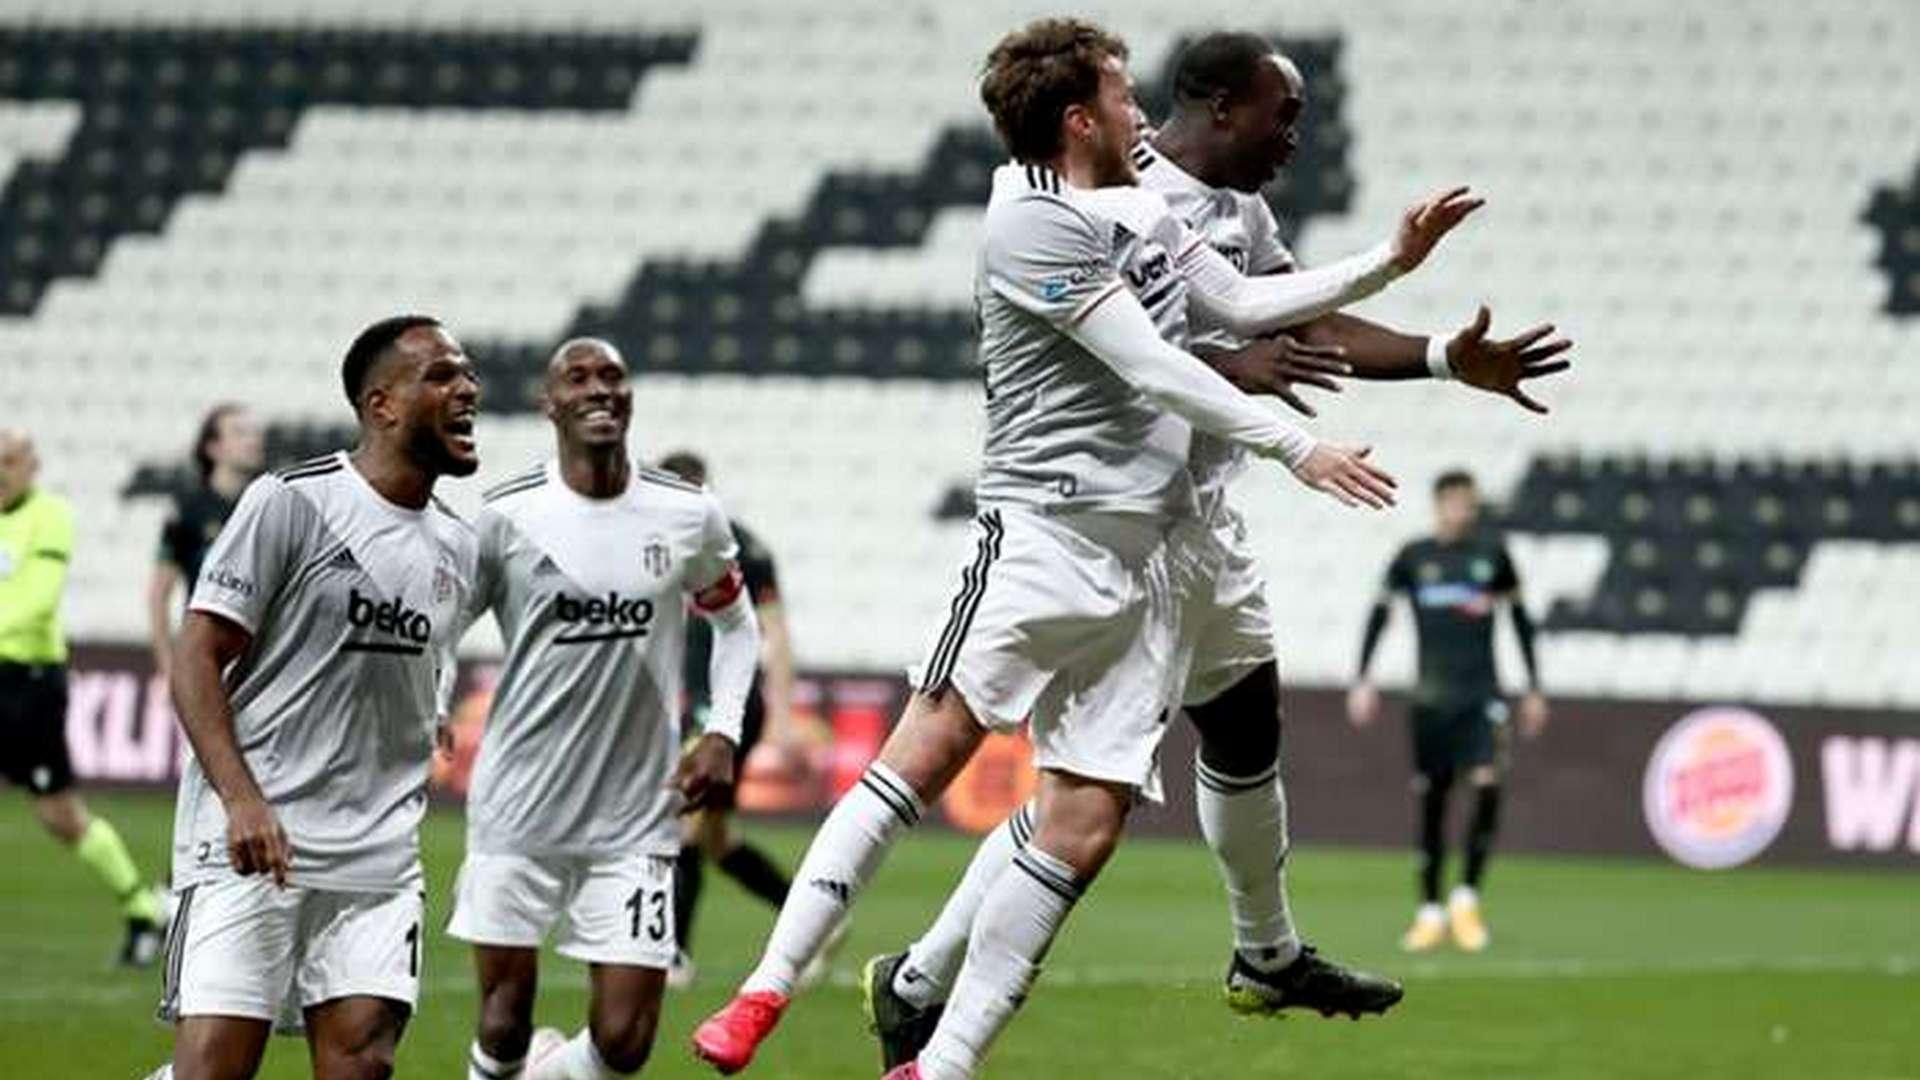 Cameroon's Aboubakar and Ghana's Mensah win Super Lig title with Besiktas in final day drama